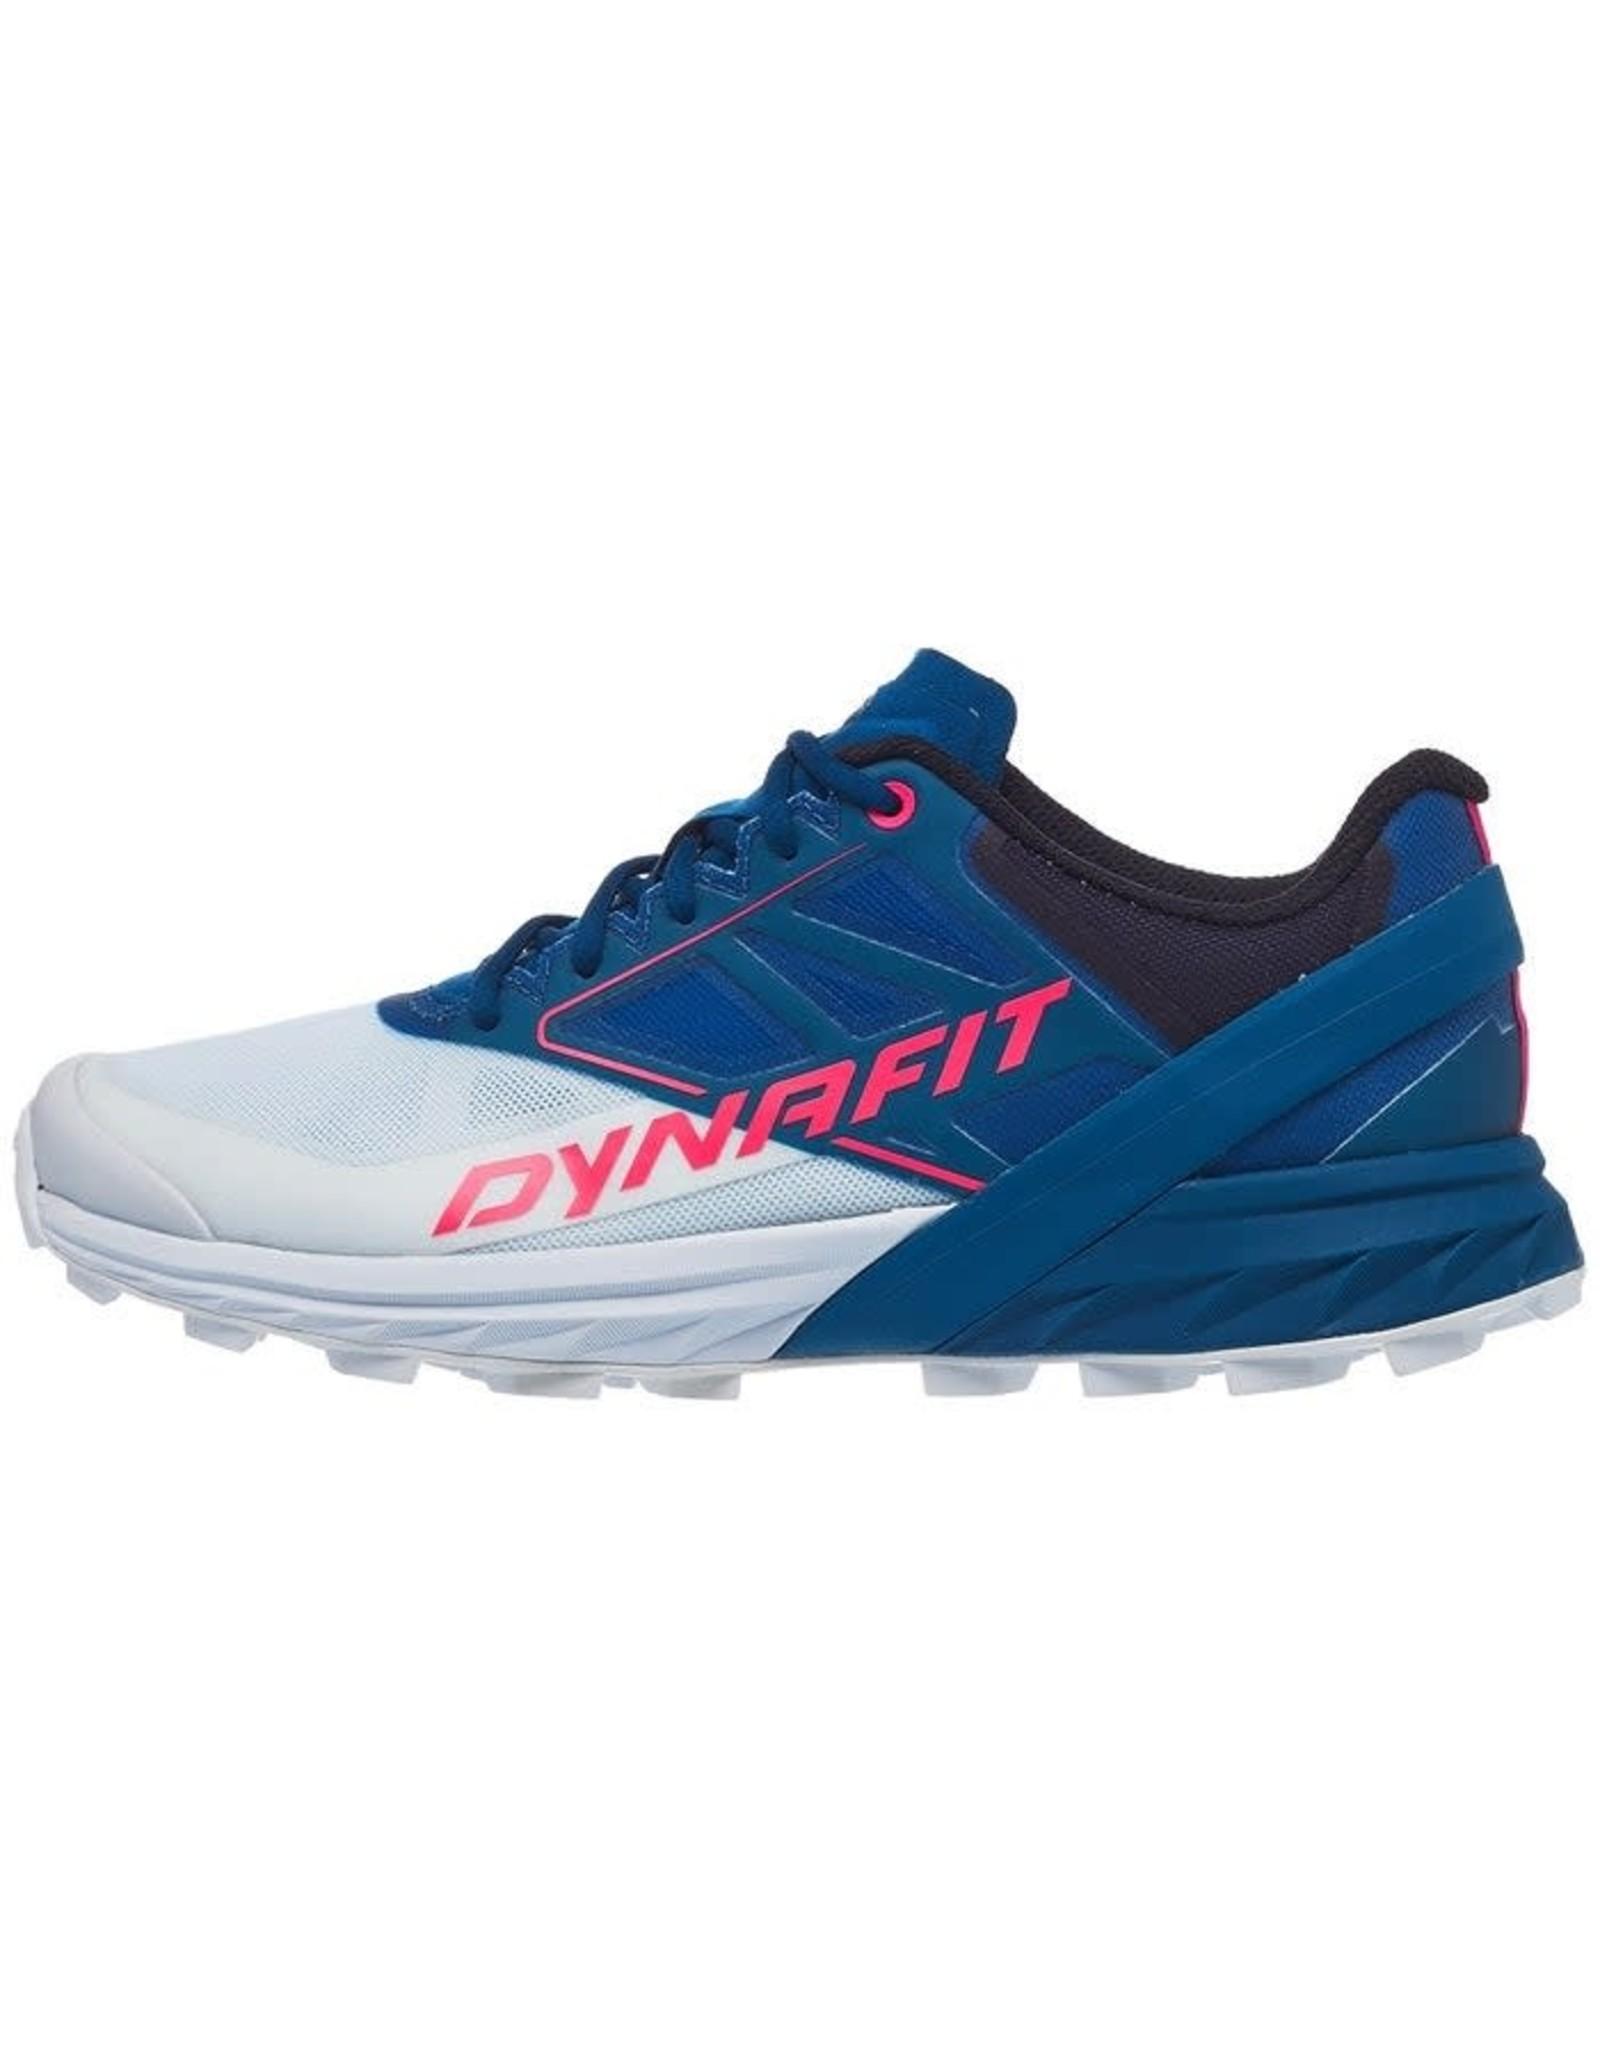 Dynafit Dynafit Alpine women's shoe